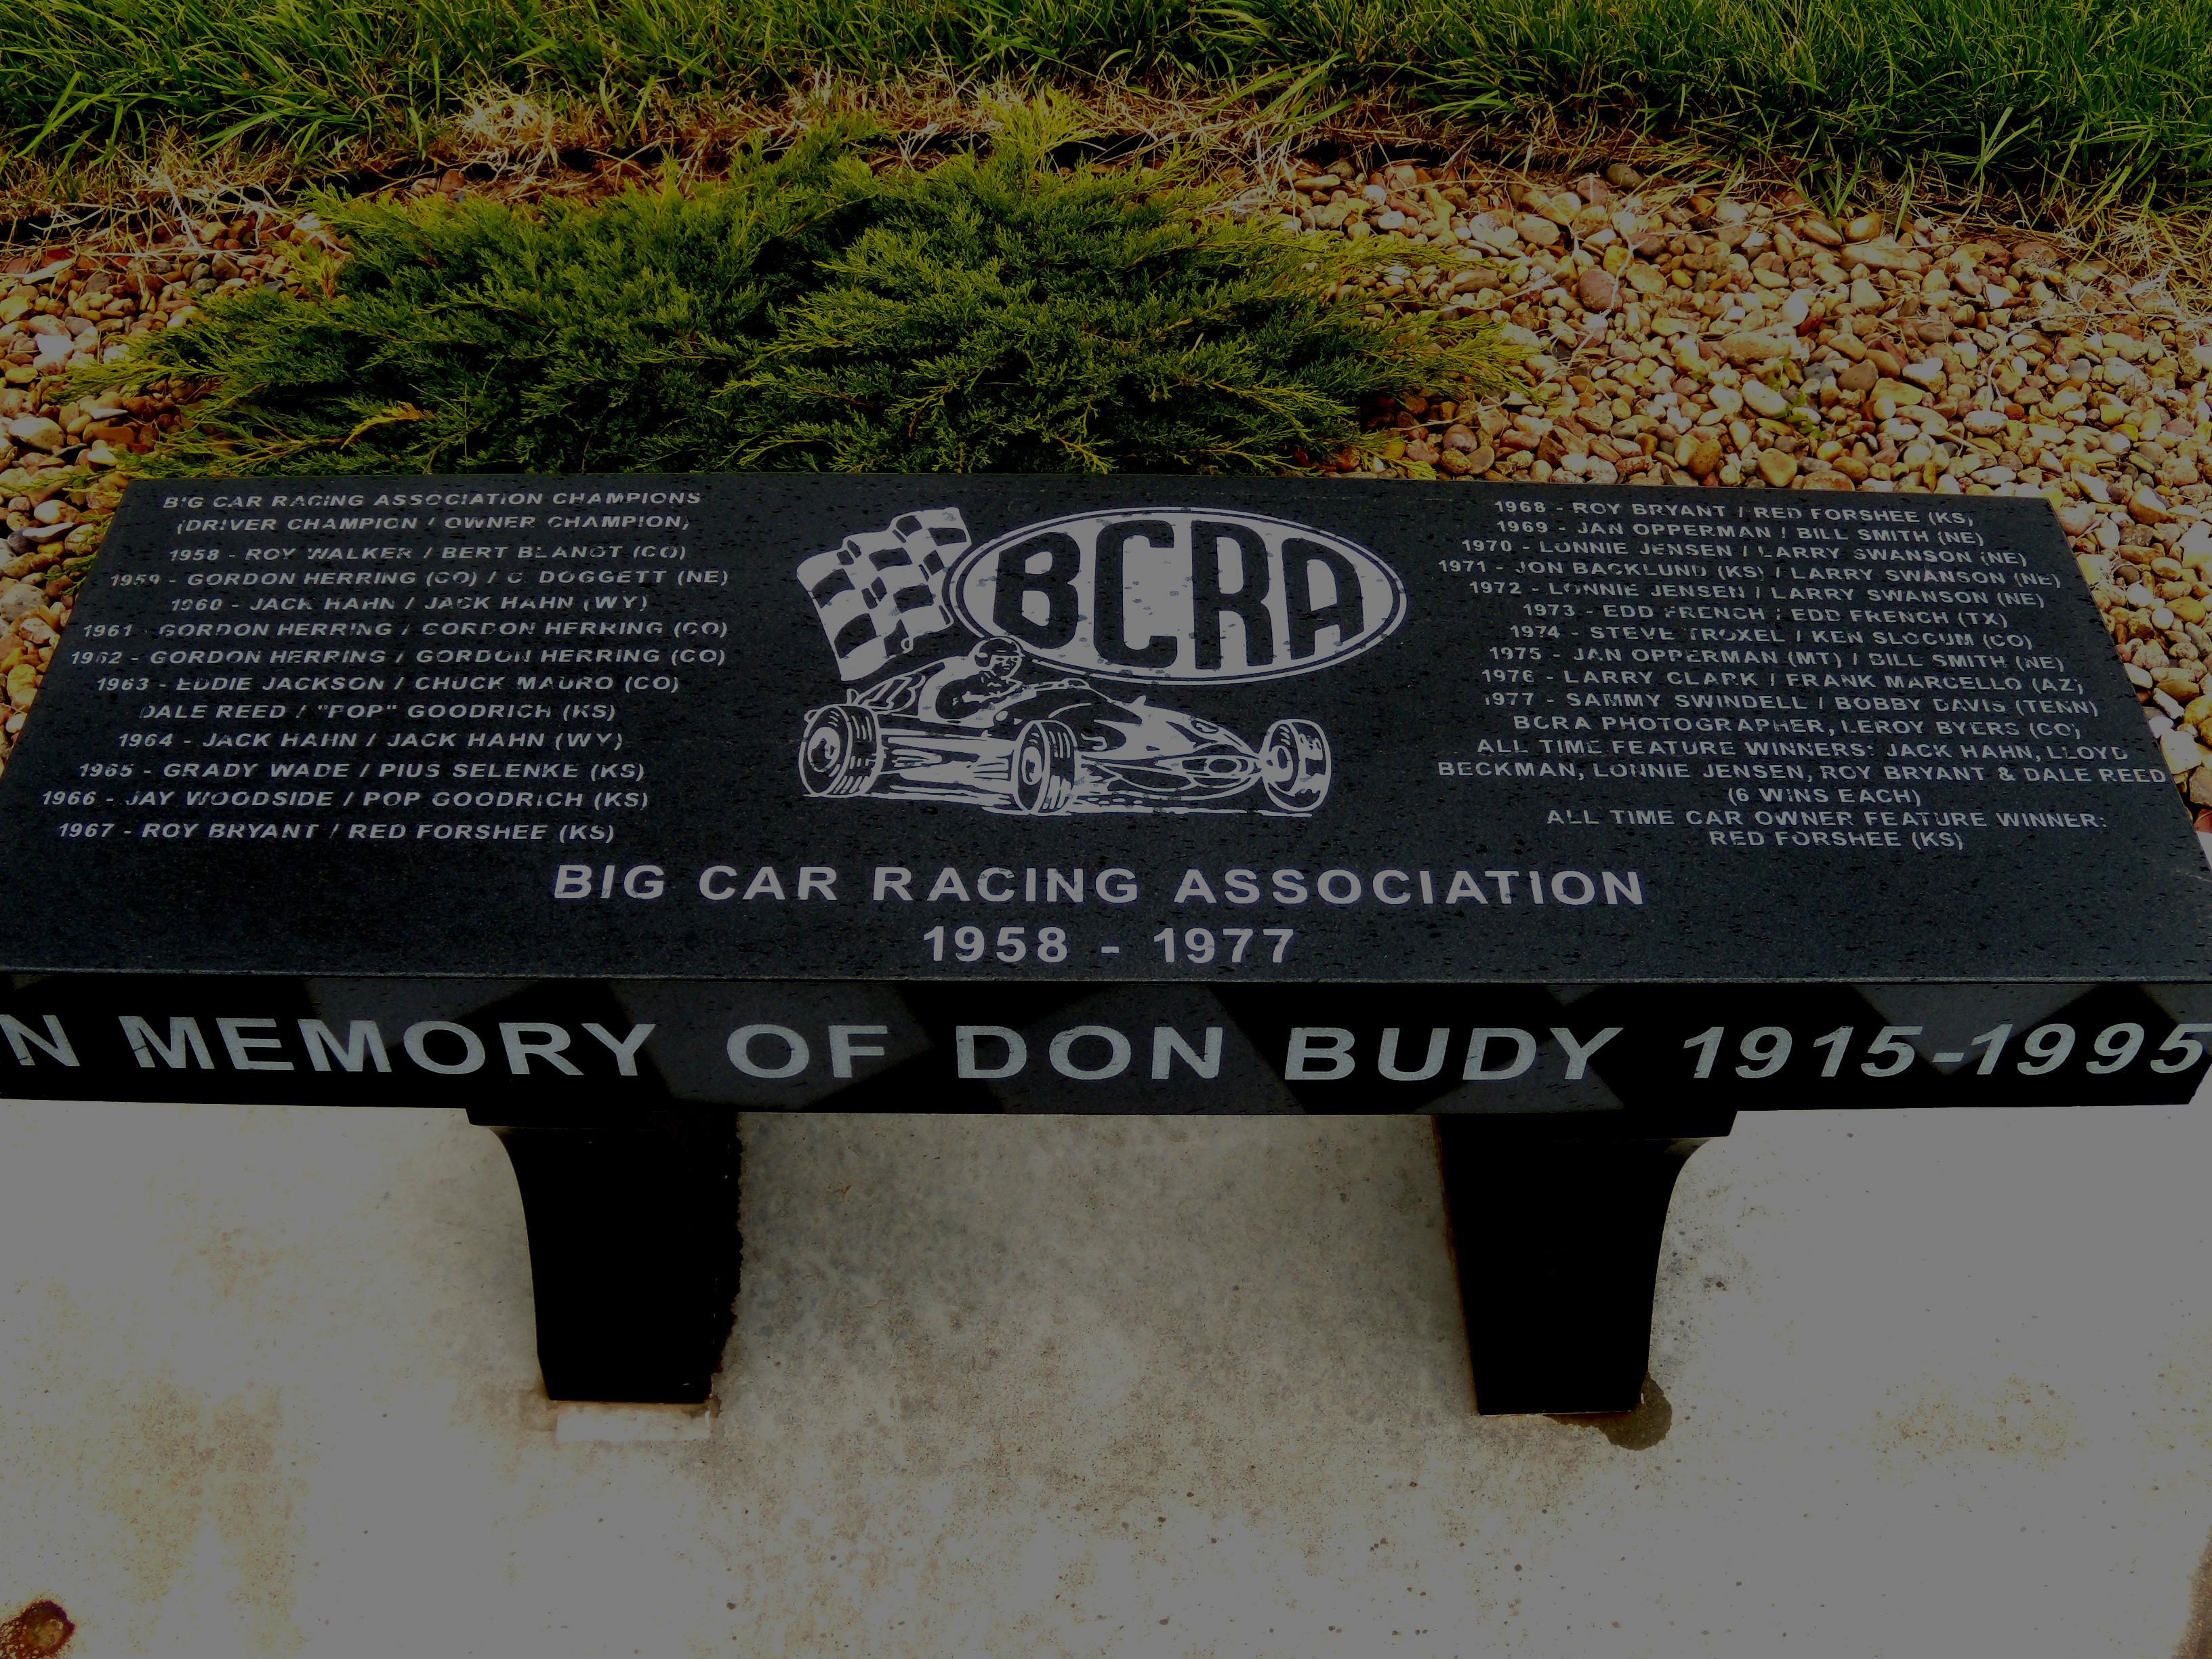 Revised commemorative bench on winners circle belleville ks 1DSCN1049